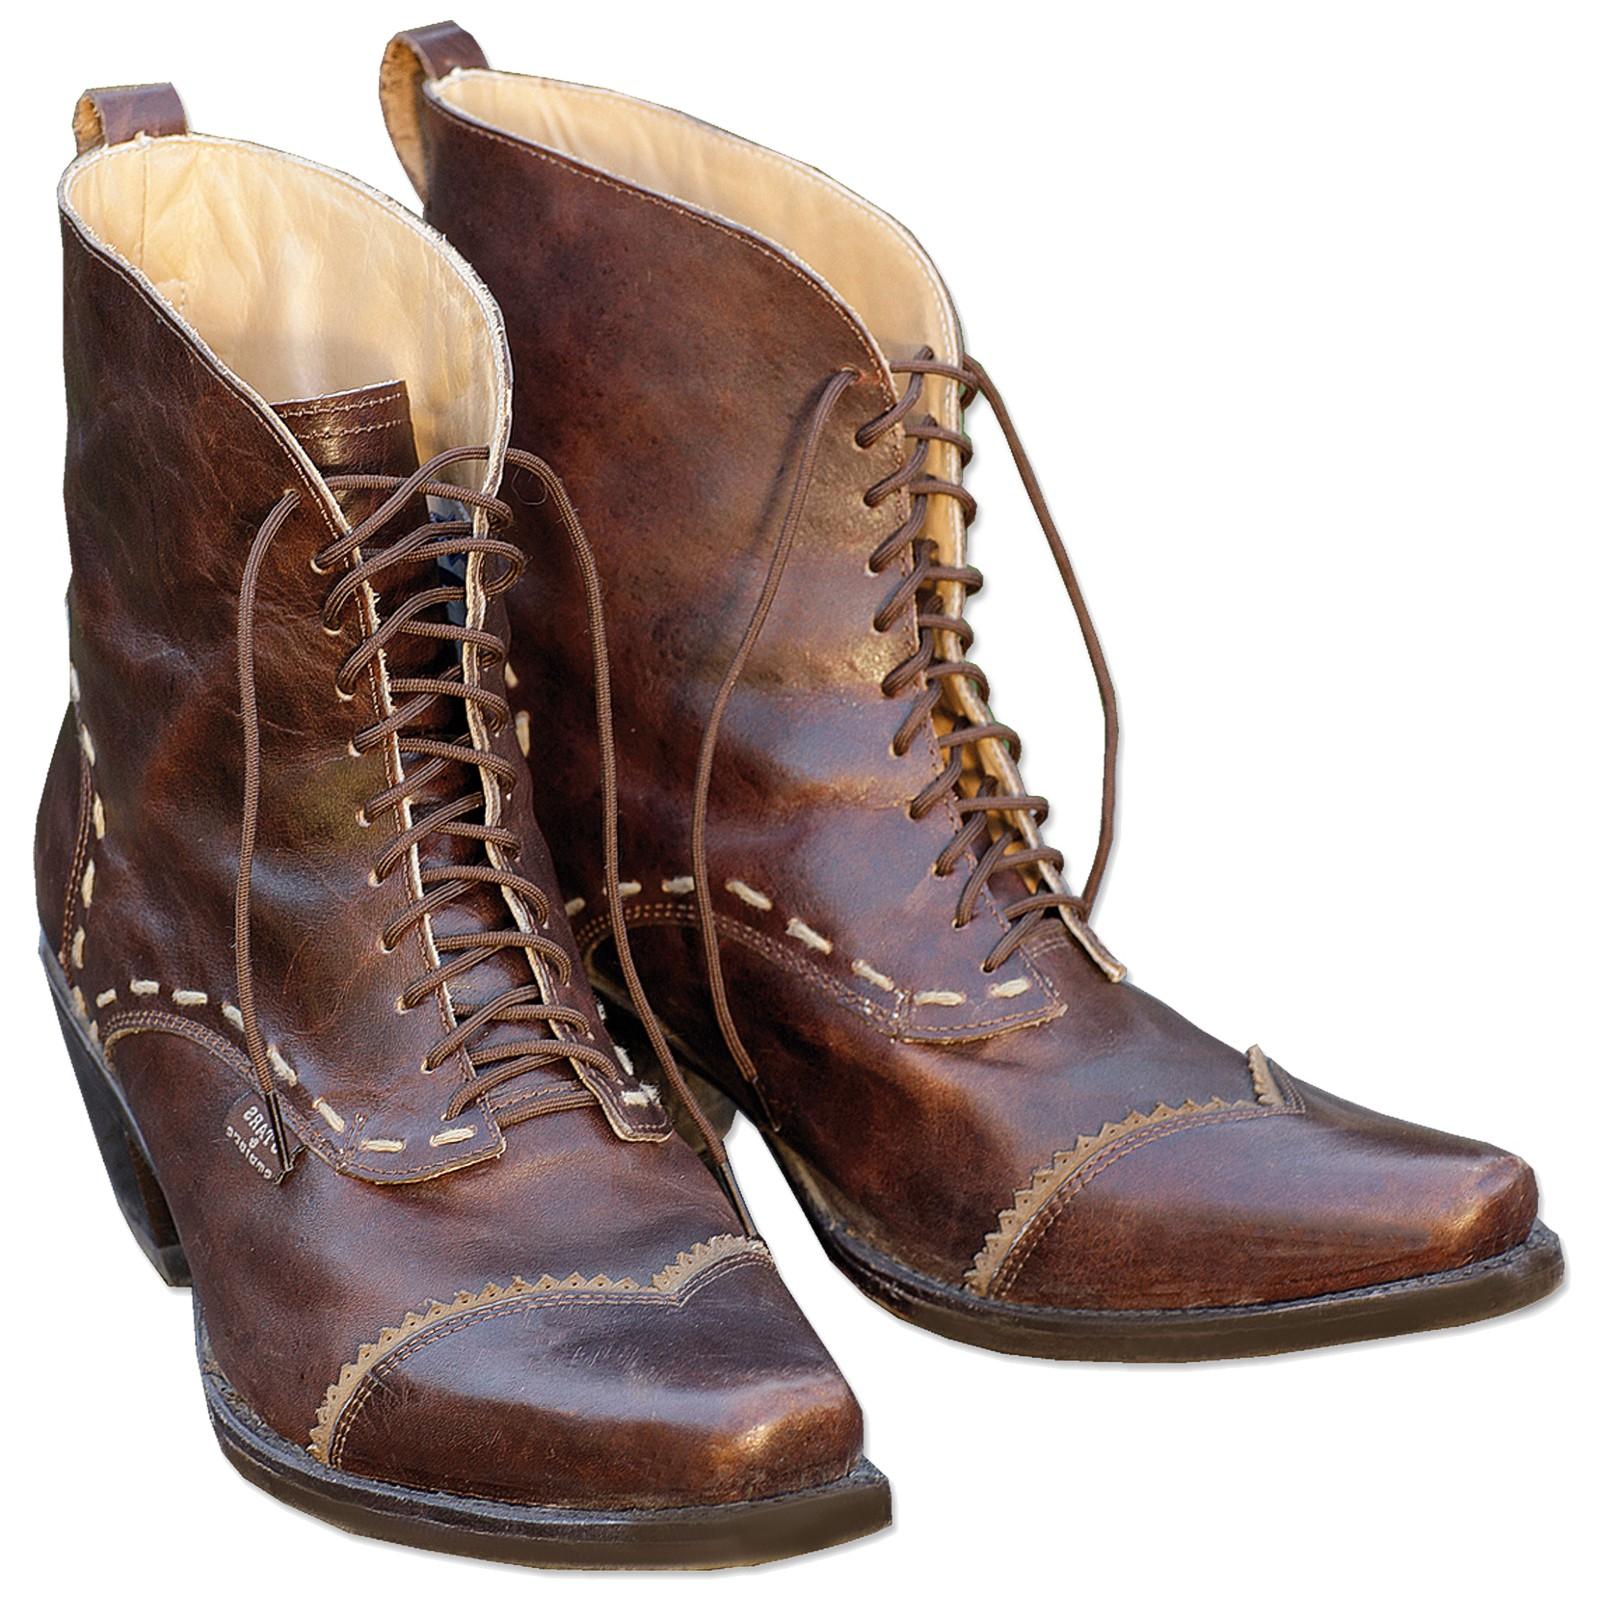 Stars & Stripes Damen Stiefel Western Boots »ASHLEY« Braun Gr.38